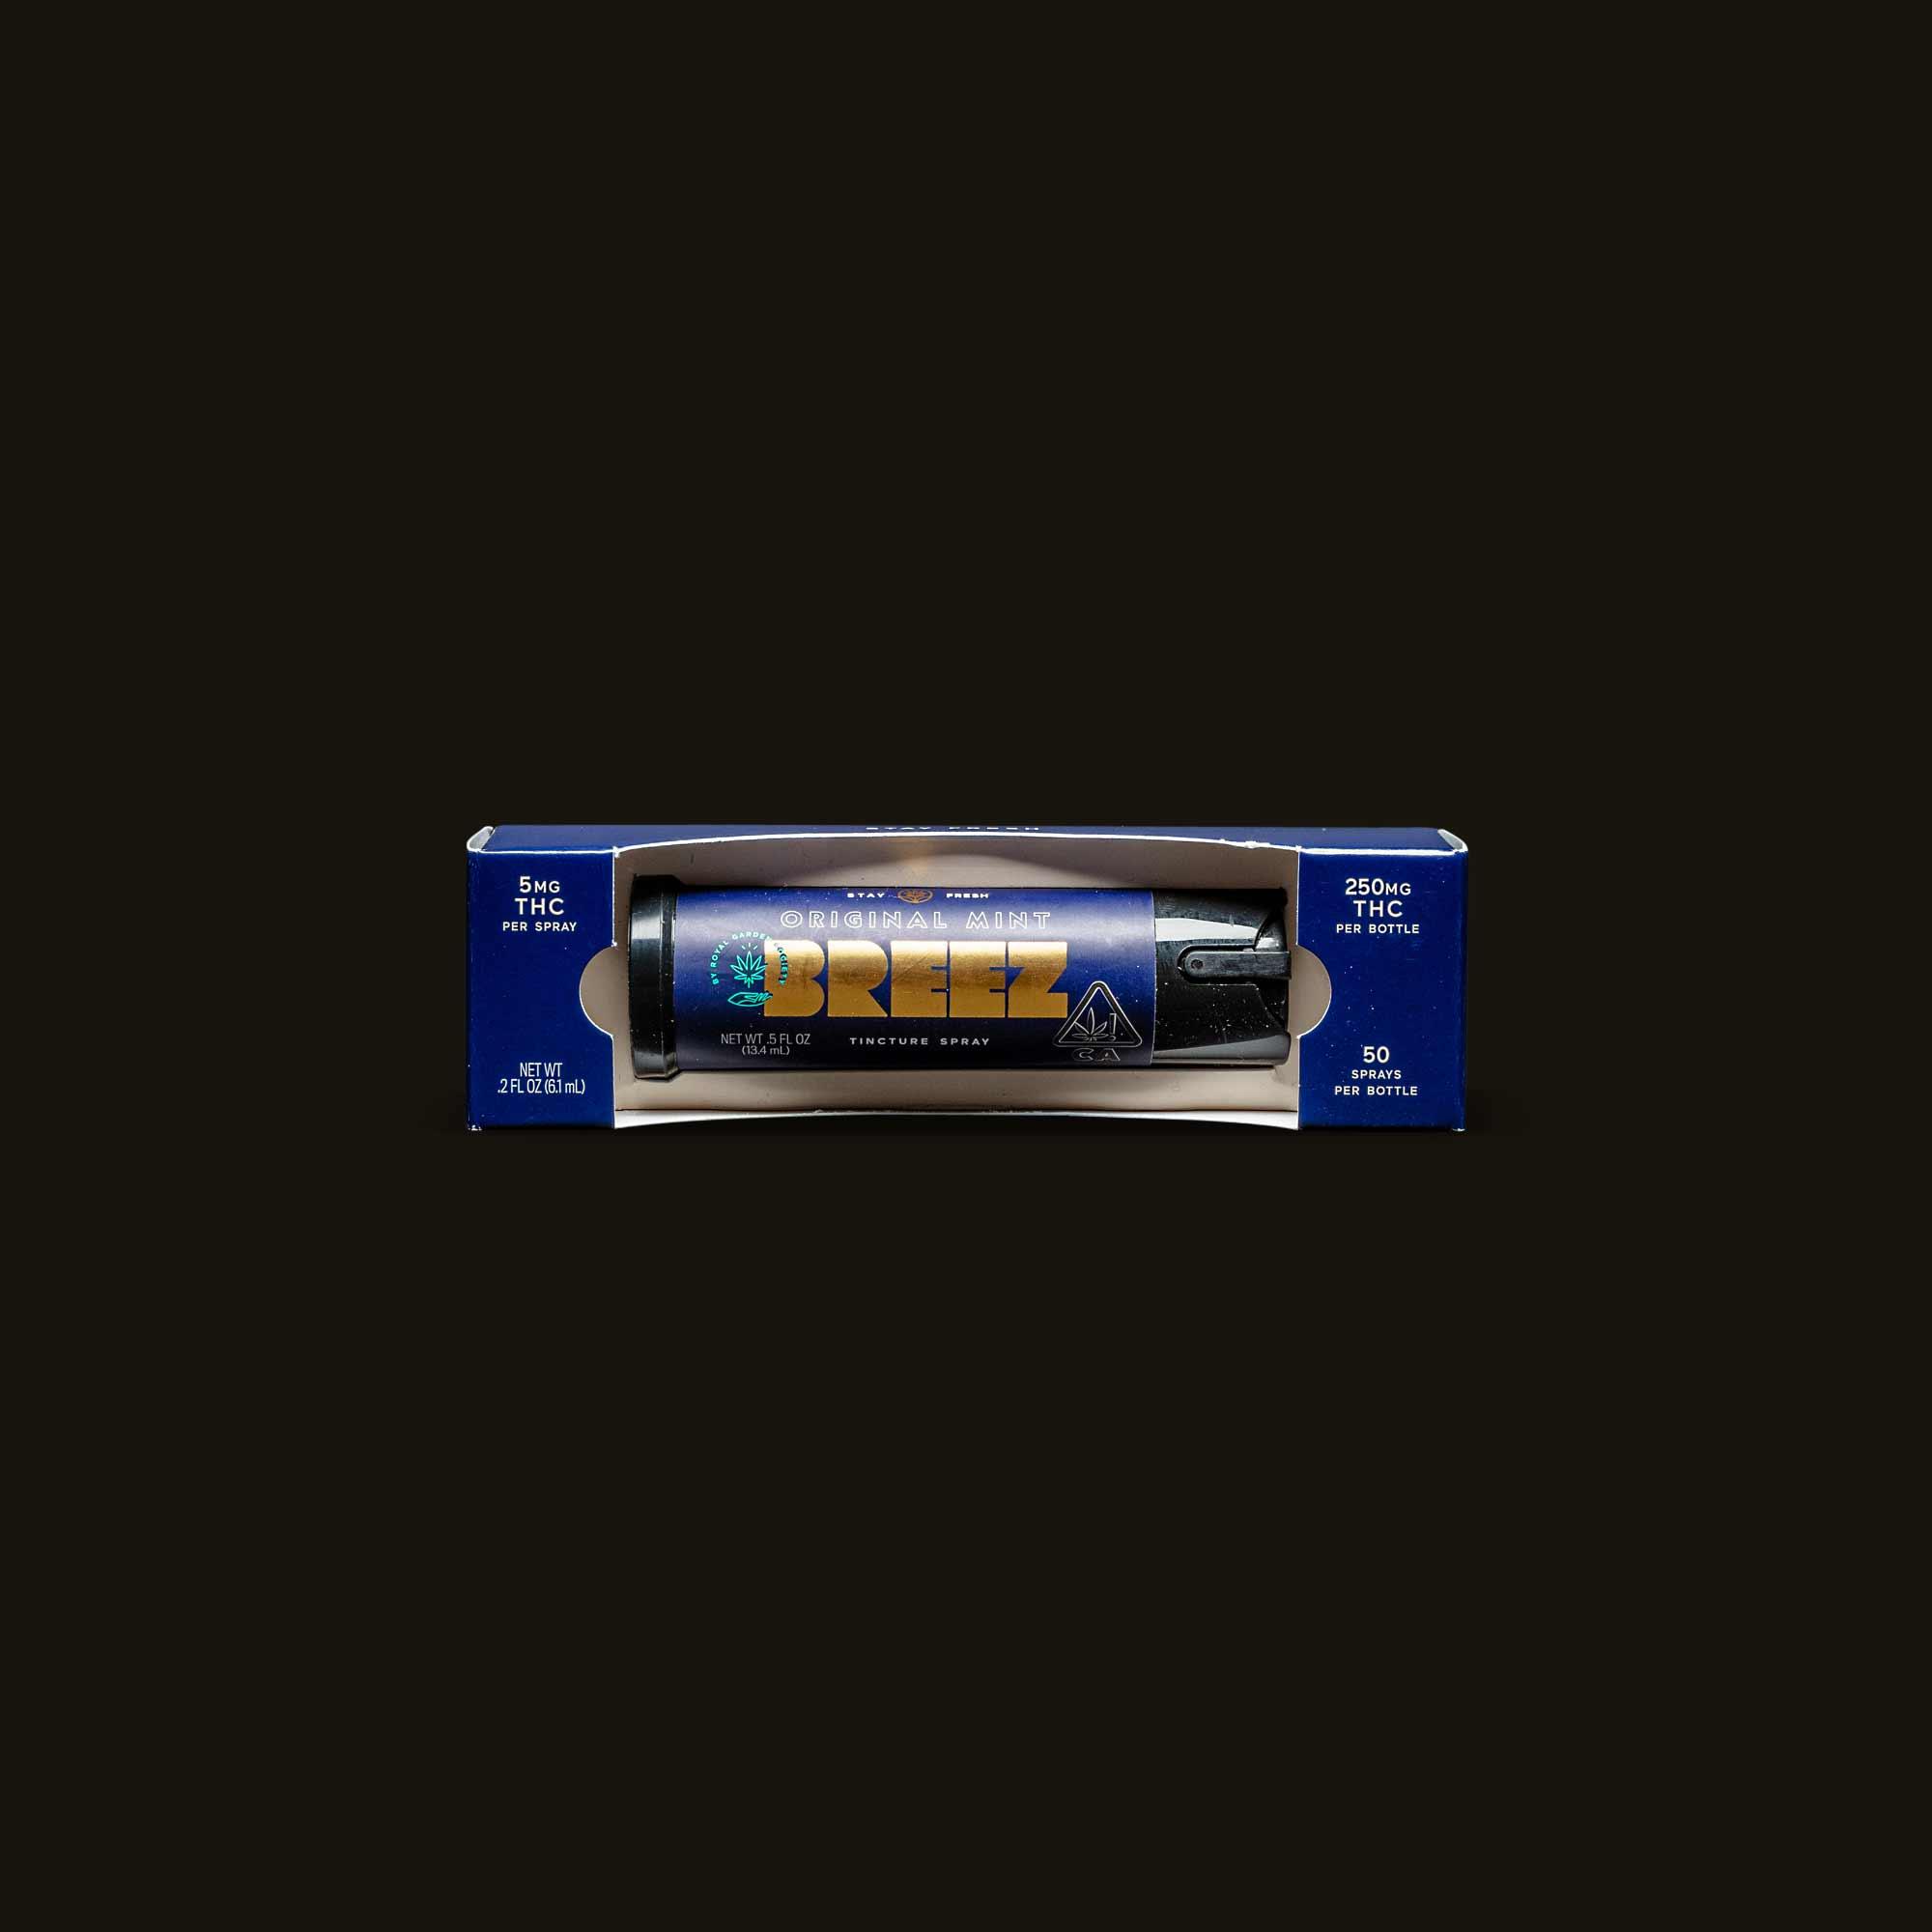 Original Mint Spray - 50 sprays (250mg THC)